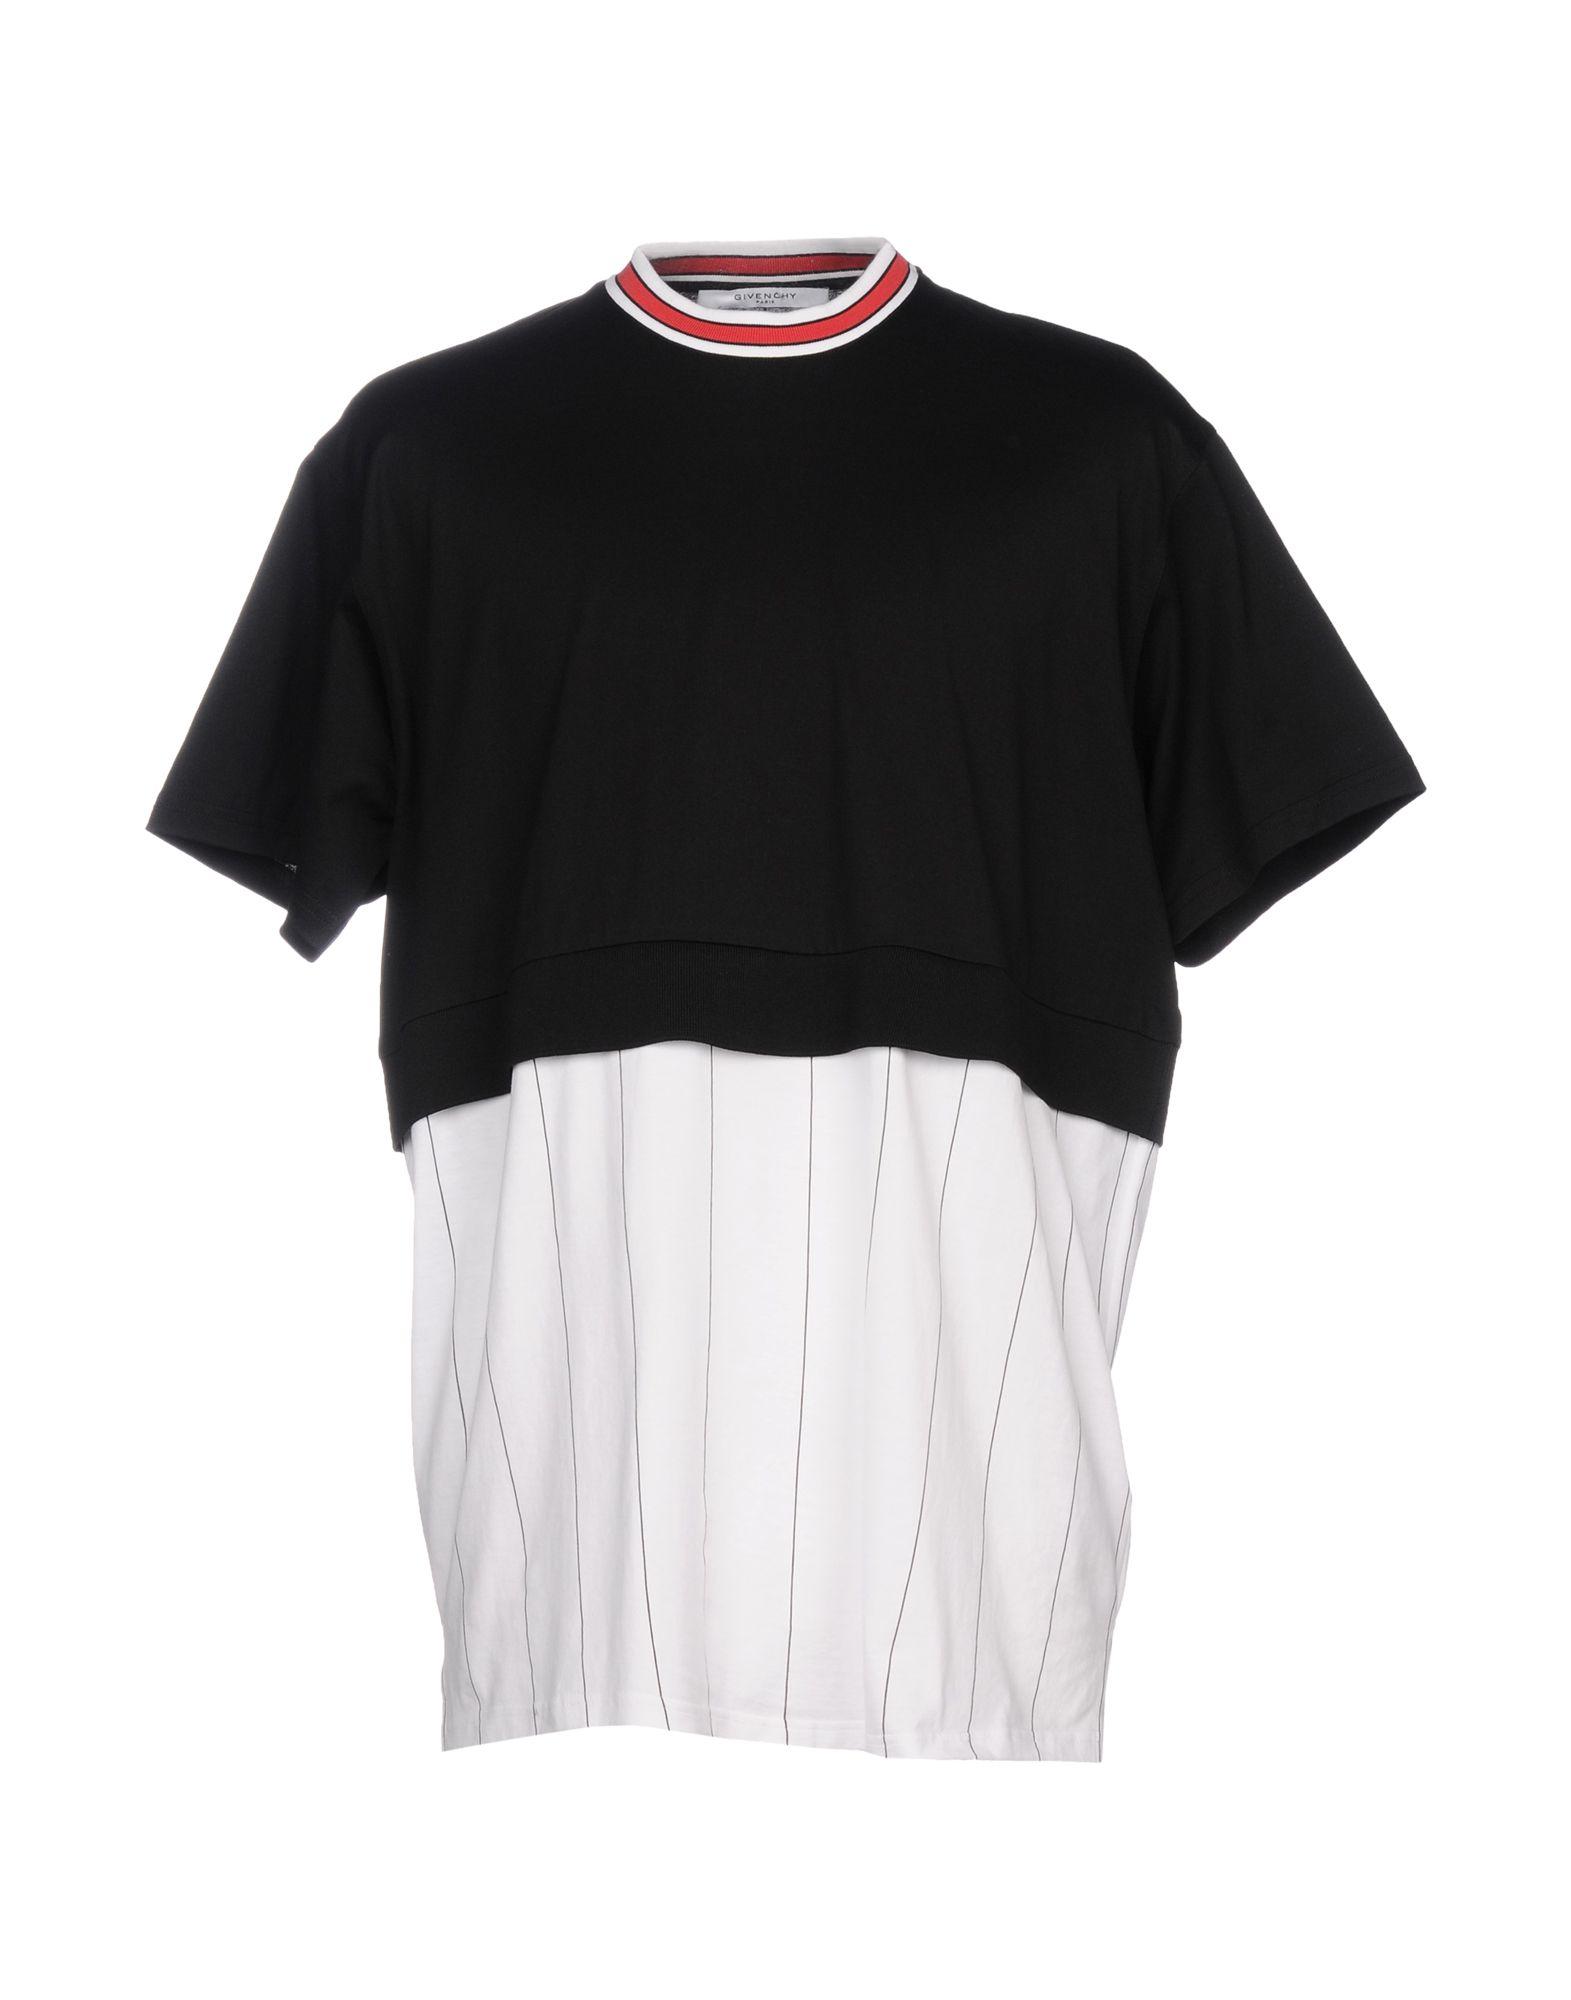 GIVENCHY Футболка футболка givenchy цвет черный